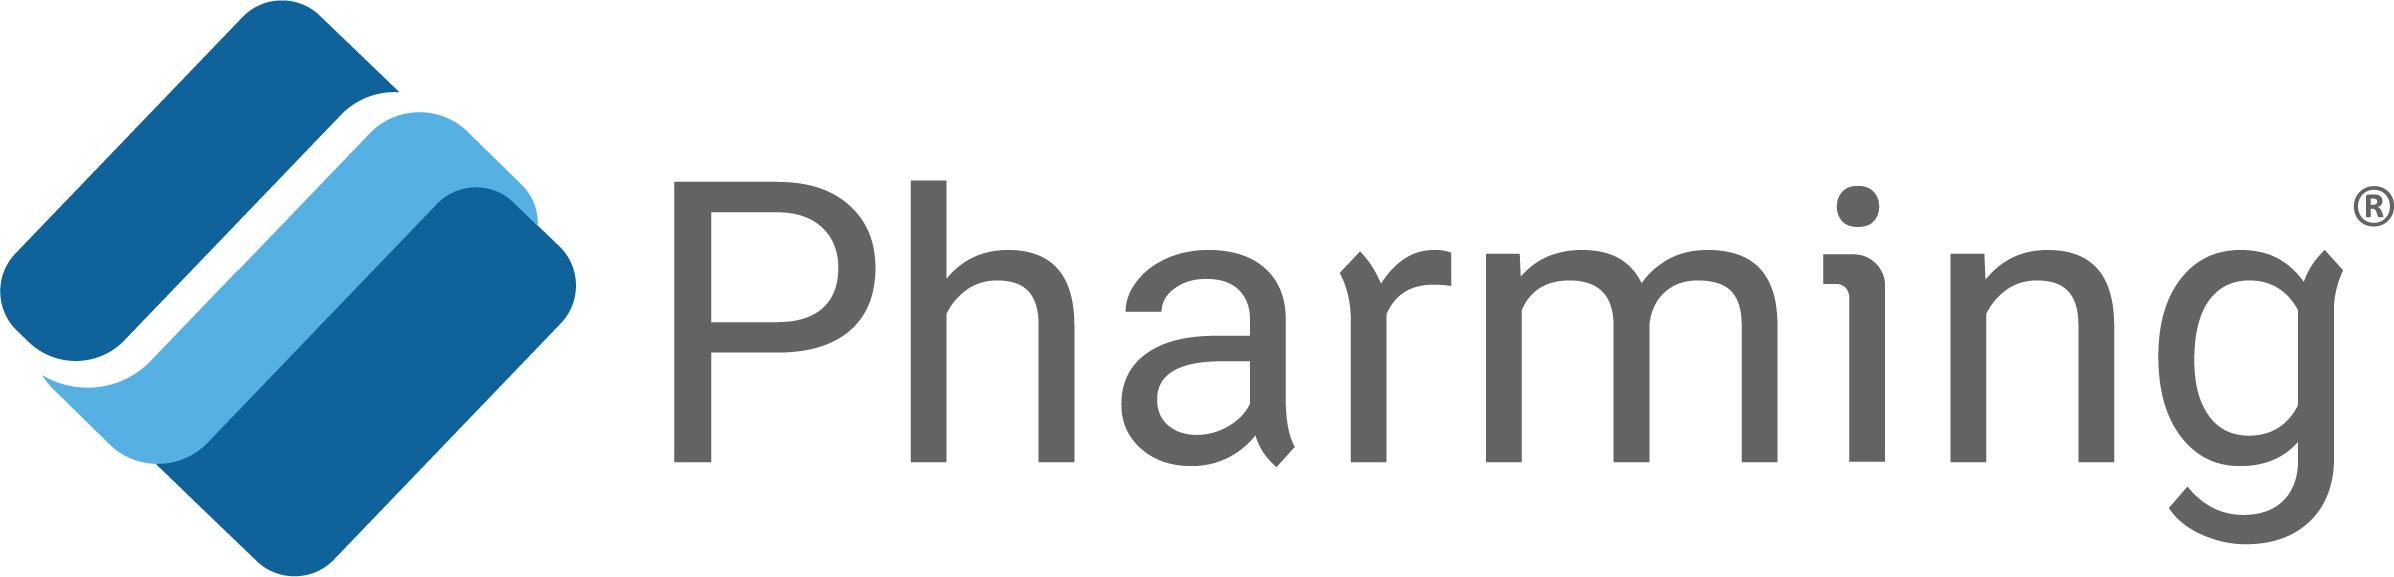 logo_greyxoriginalx1.jpg